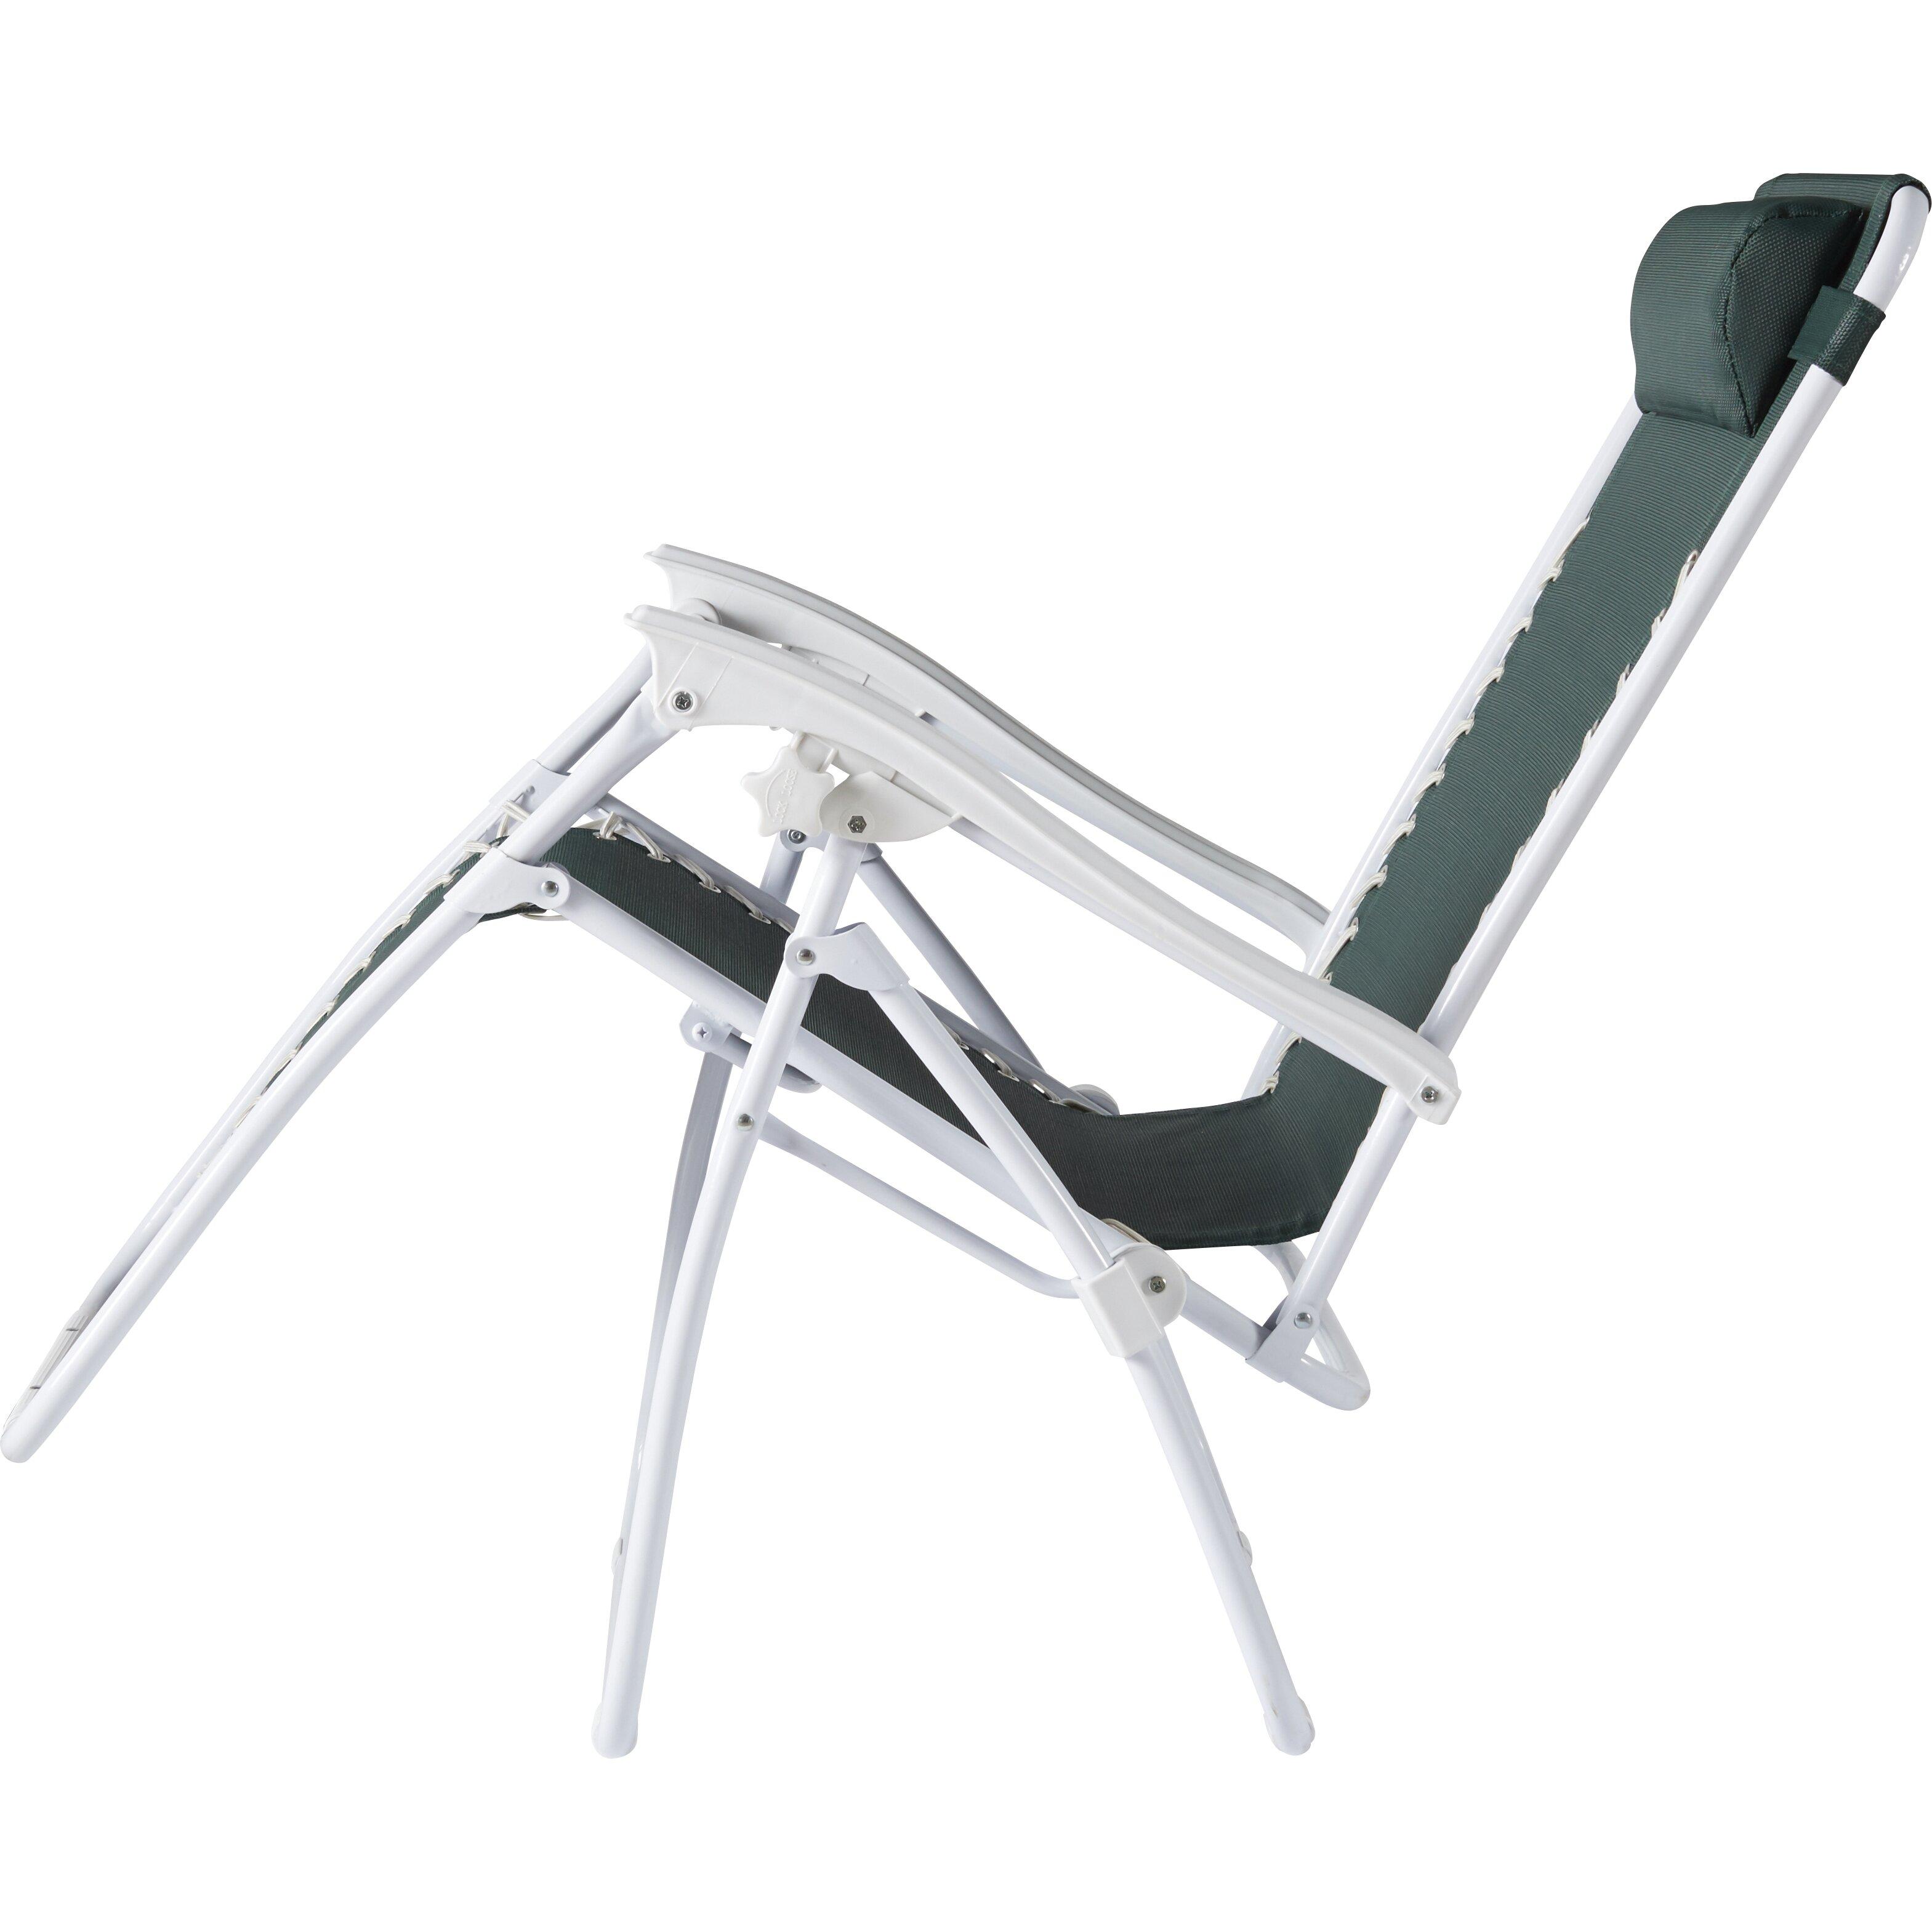 Symple stuff zero gravity chair reviews wayfair for Chair zero review